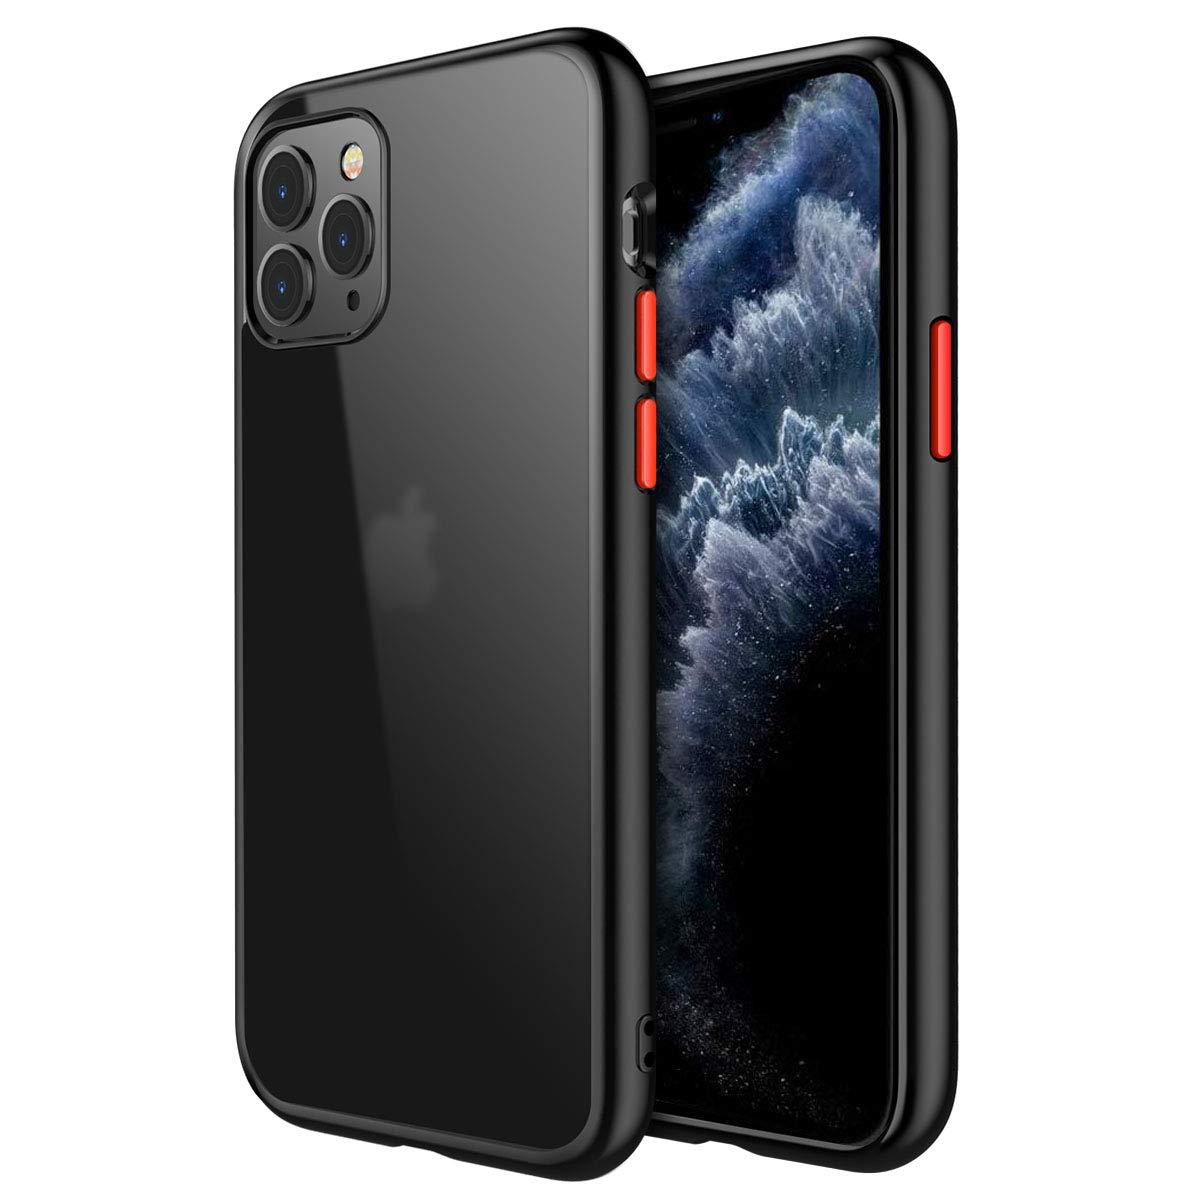 joyroom Matte Case for iPhone 11 Pro, iPhone 11 Pro Case Black, Protective Translucent Hard PC Cases Ultra Hybrid Design [Military Grade Drop Tested] Full Shockproof Cover